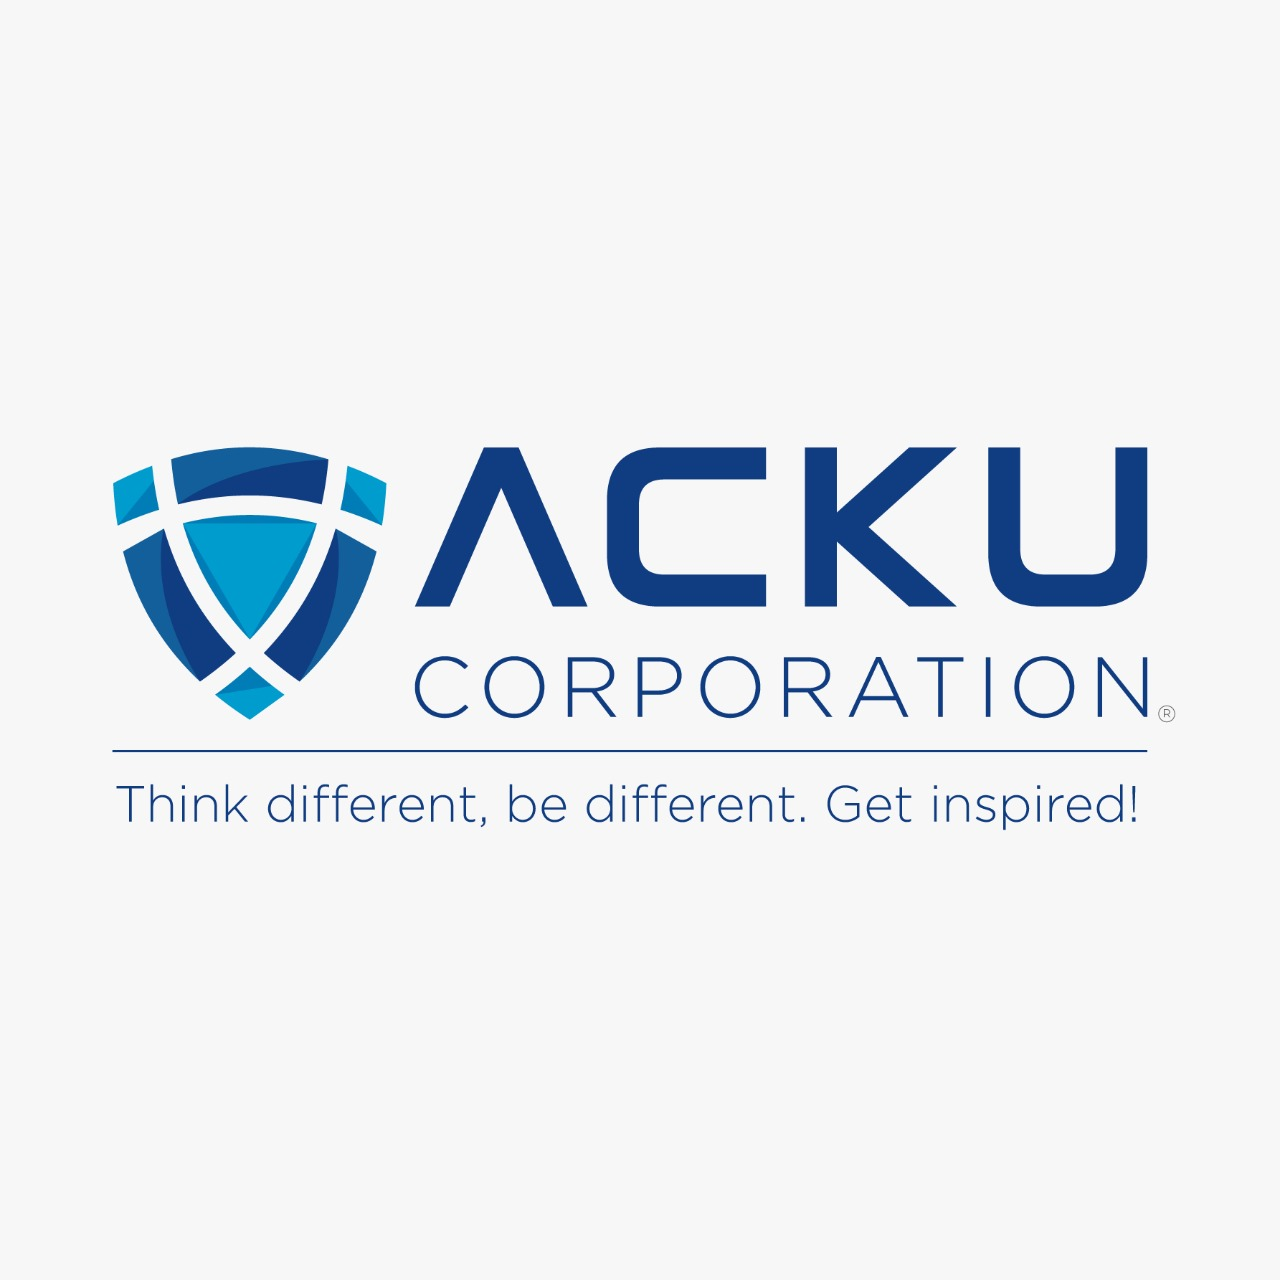 ACKU CORPORATION